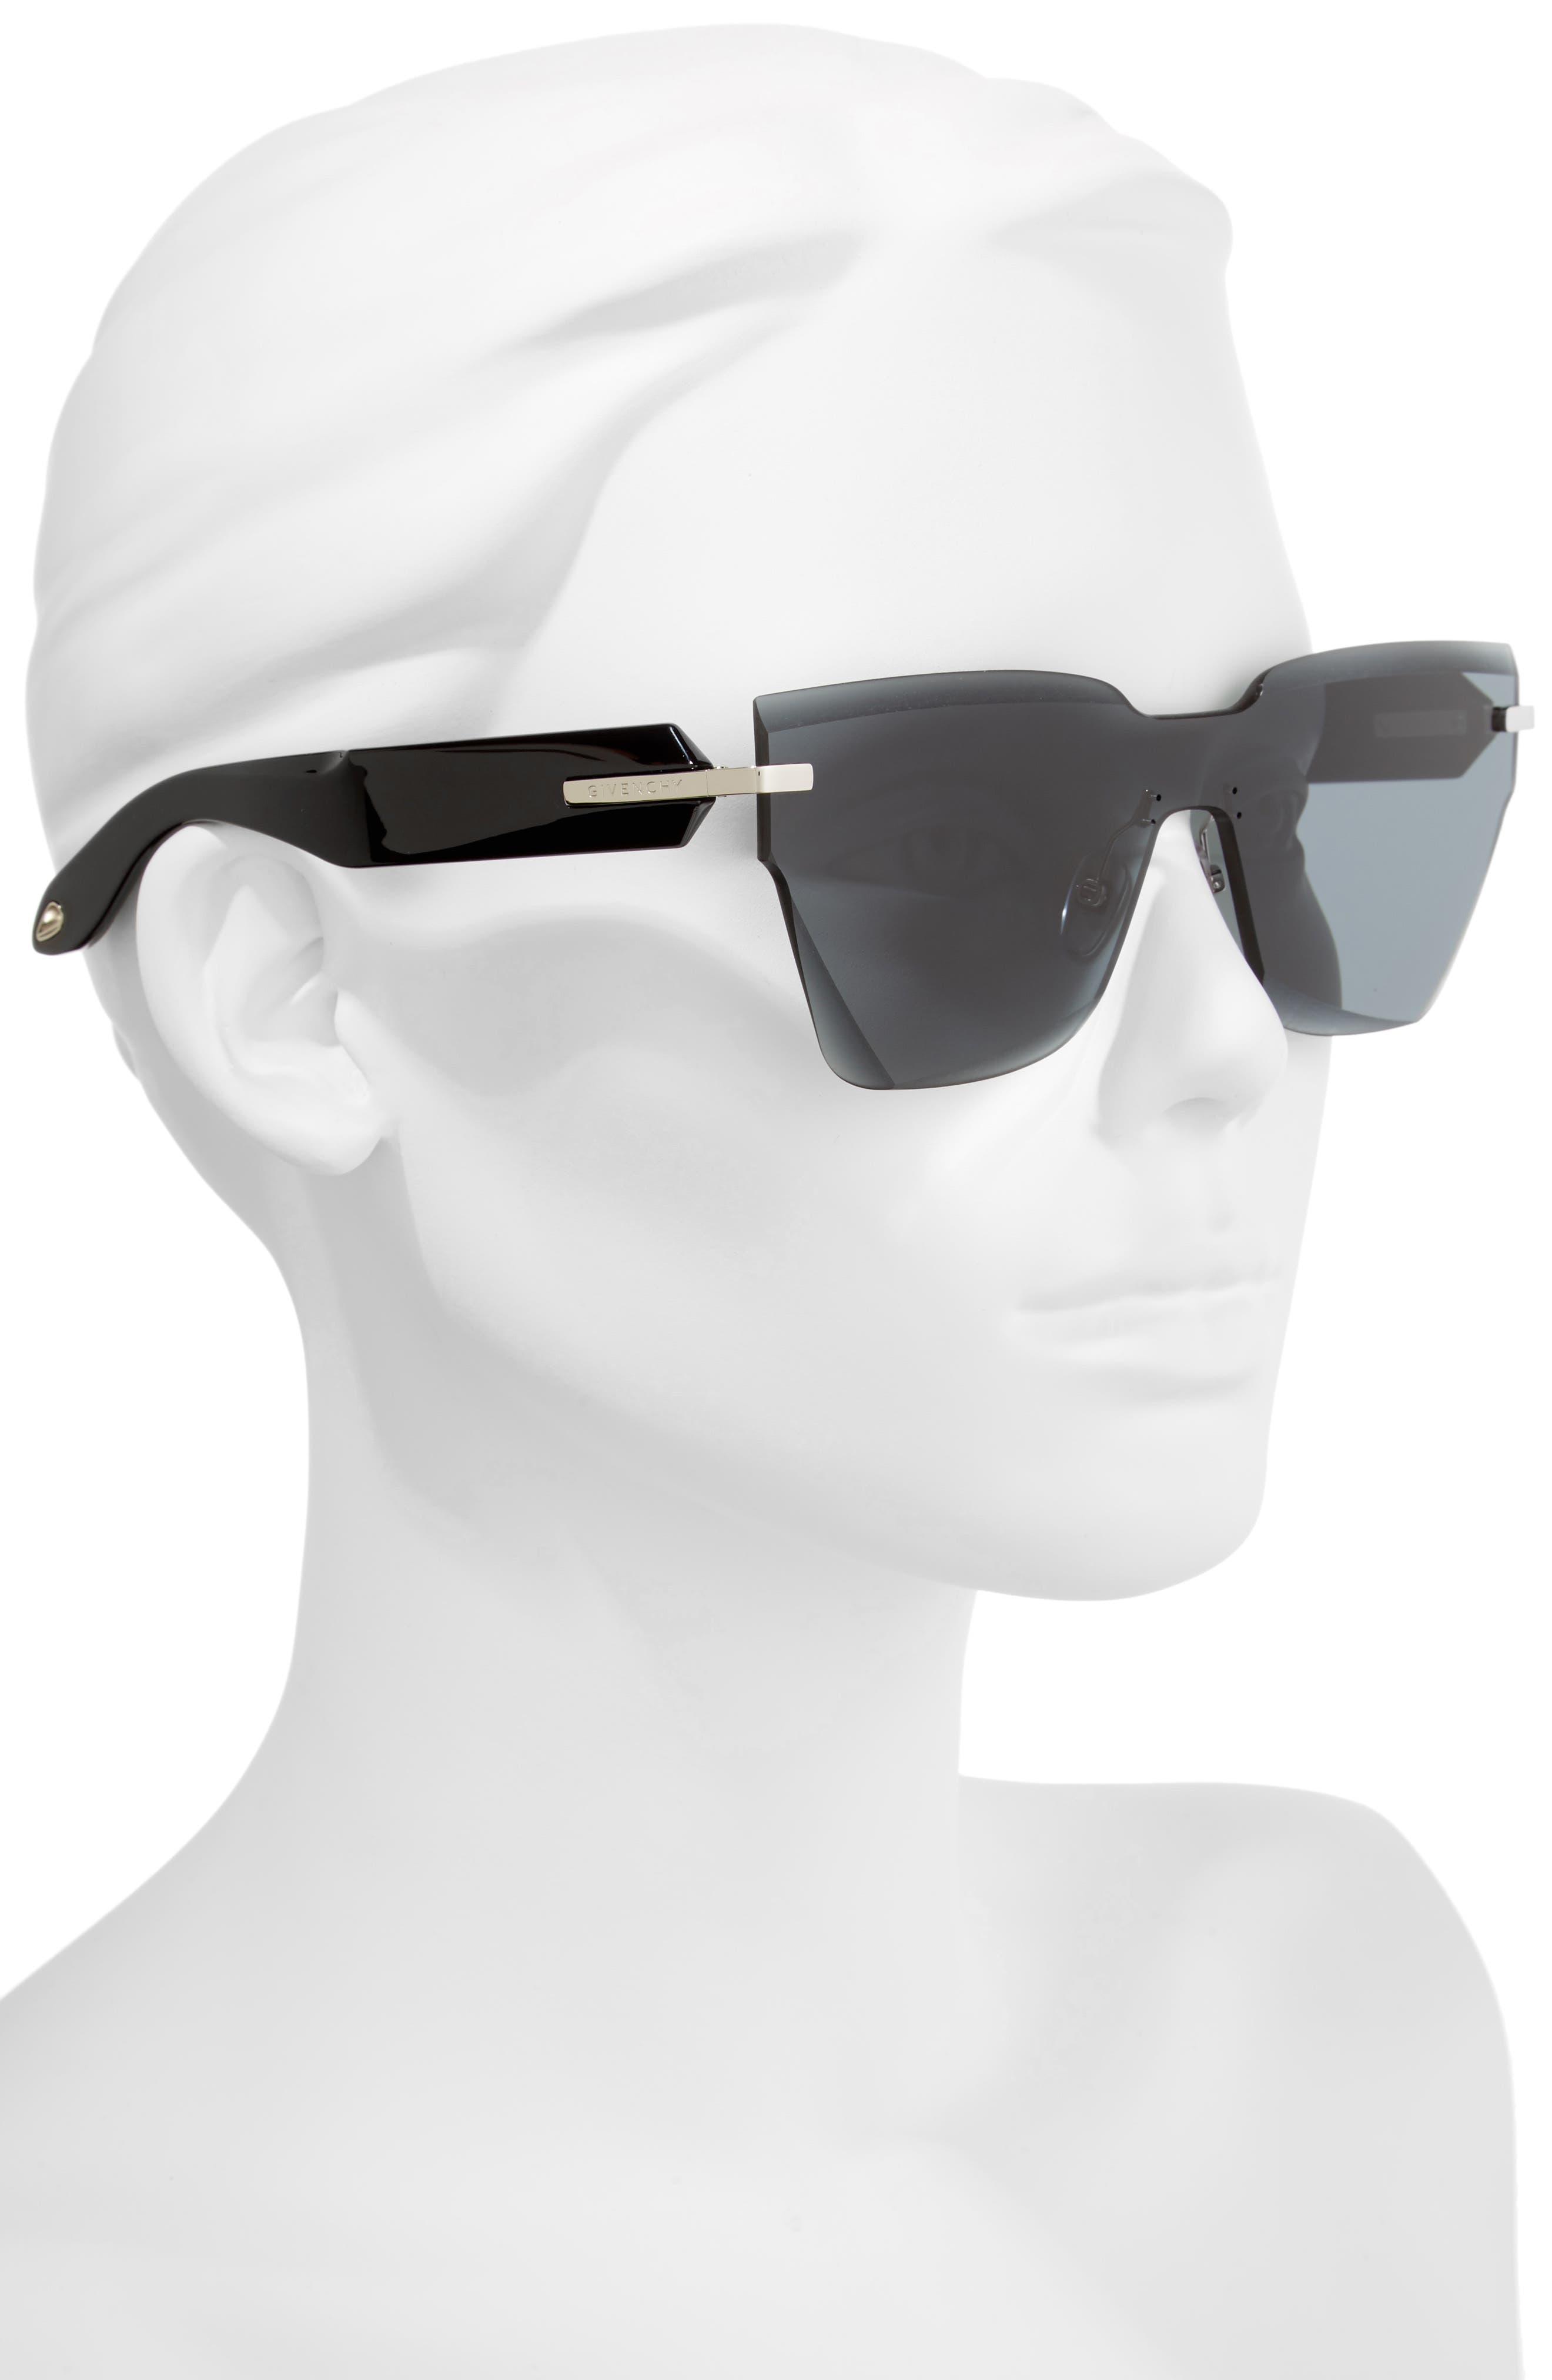 55mm Rimless Shield Sunglasses,                             Alternate thumbnail 2, color,                             GREY BLACK